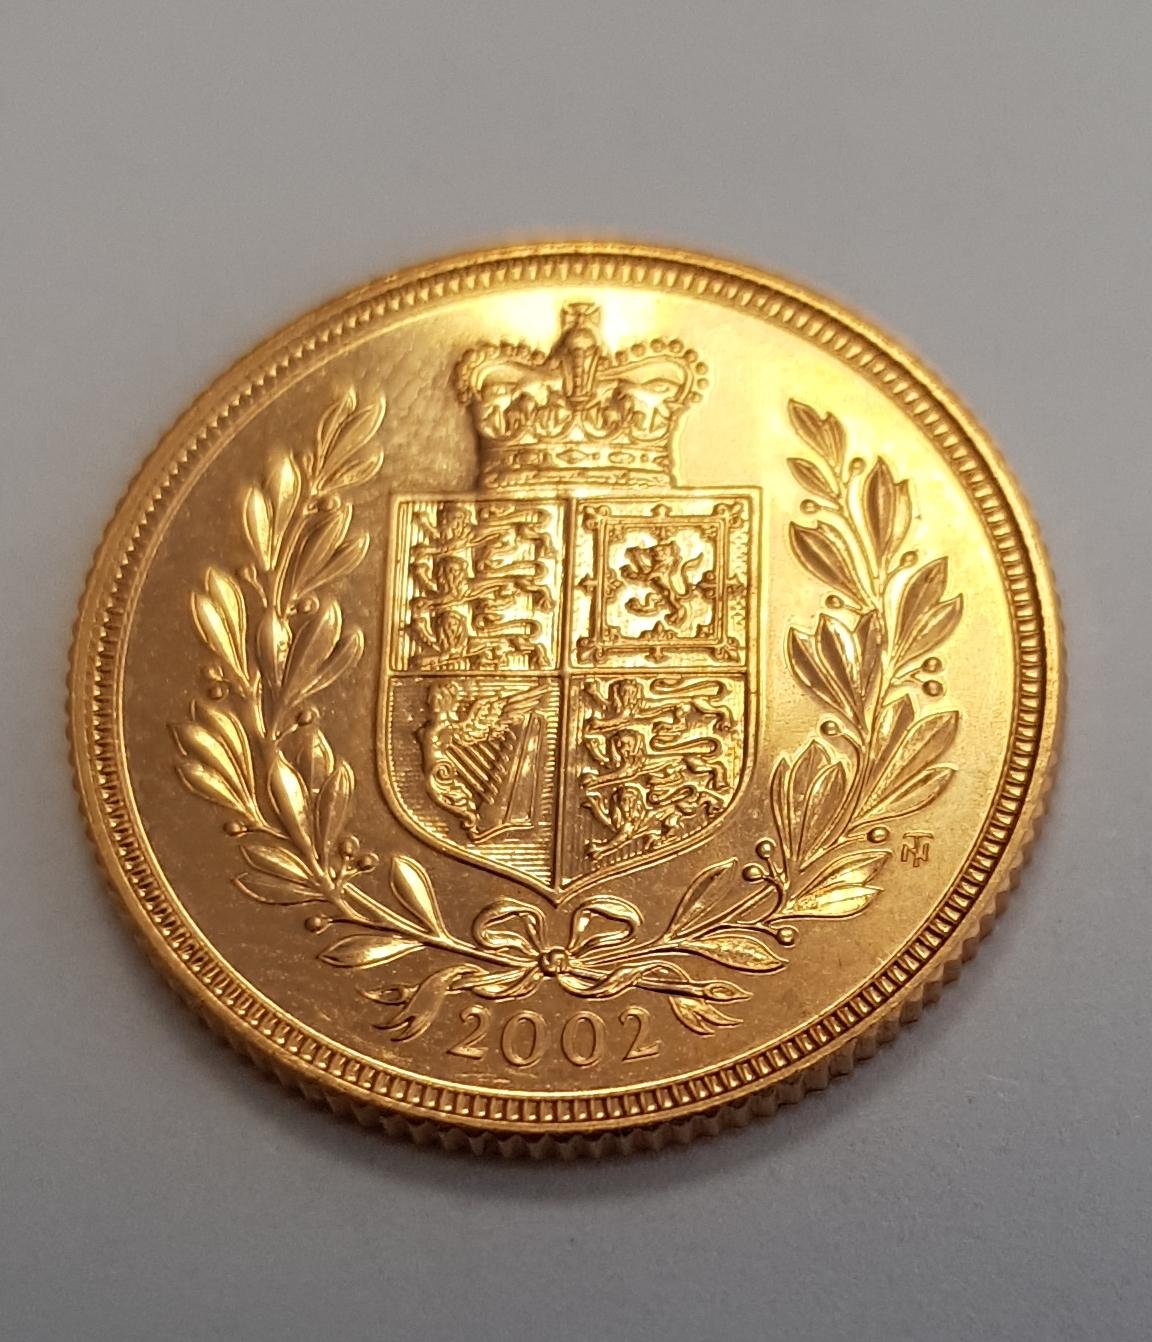 1 Pfund Sovereign proof 2002